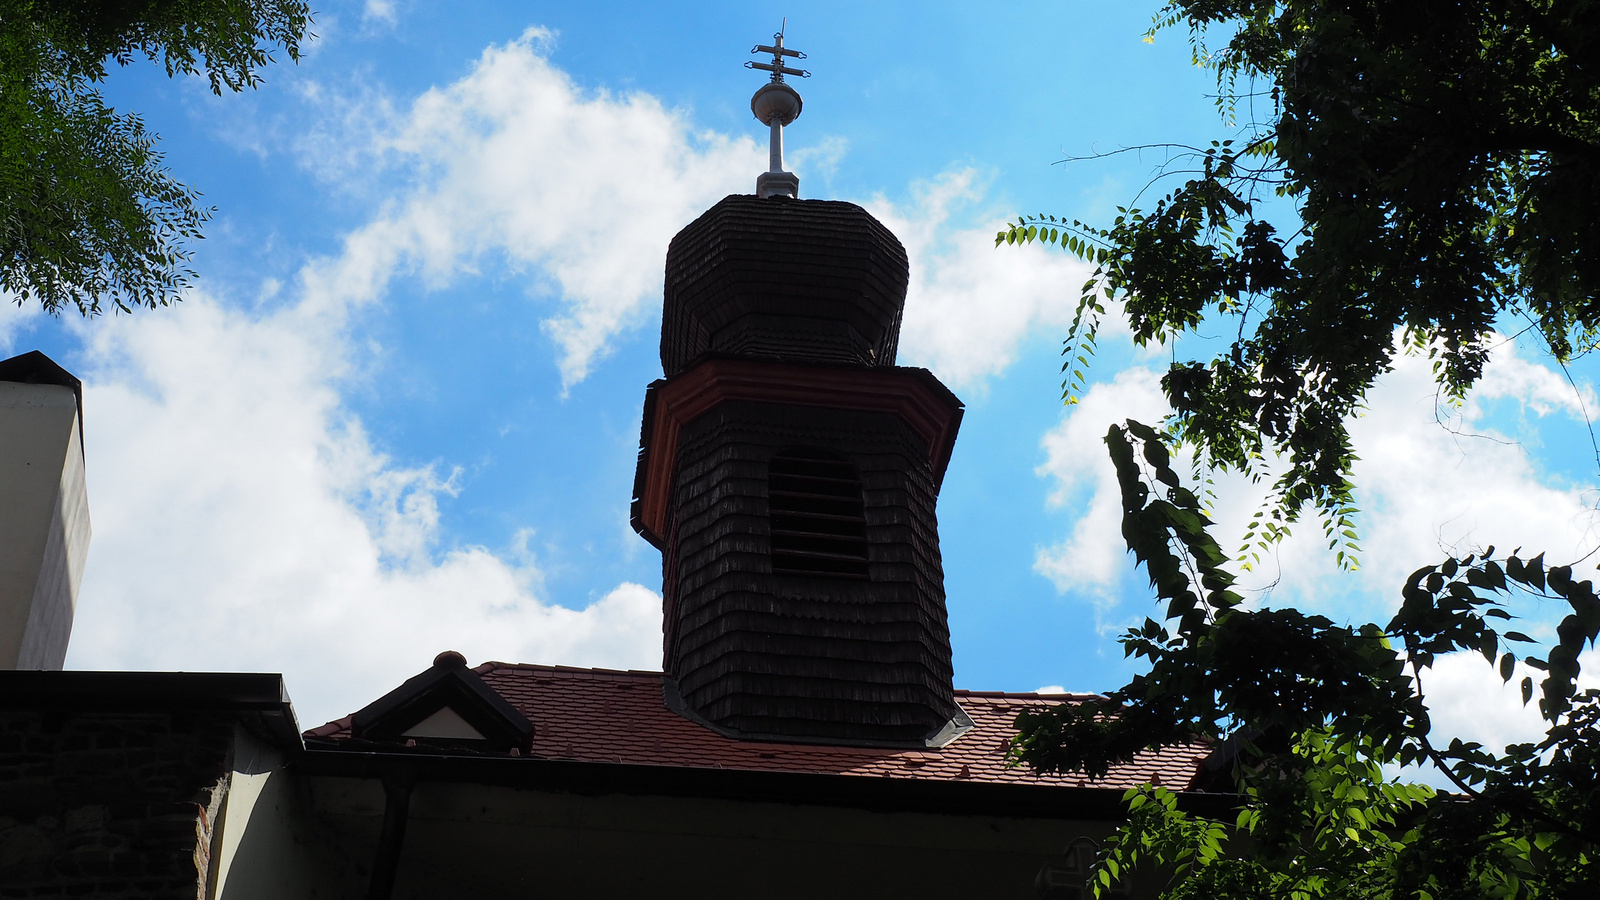 Pozsony, Kostol Notre Dame, SzG3